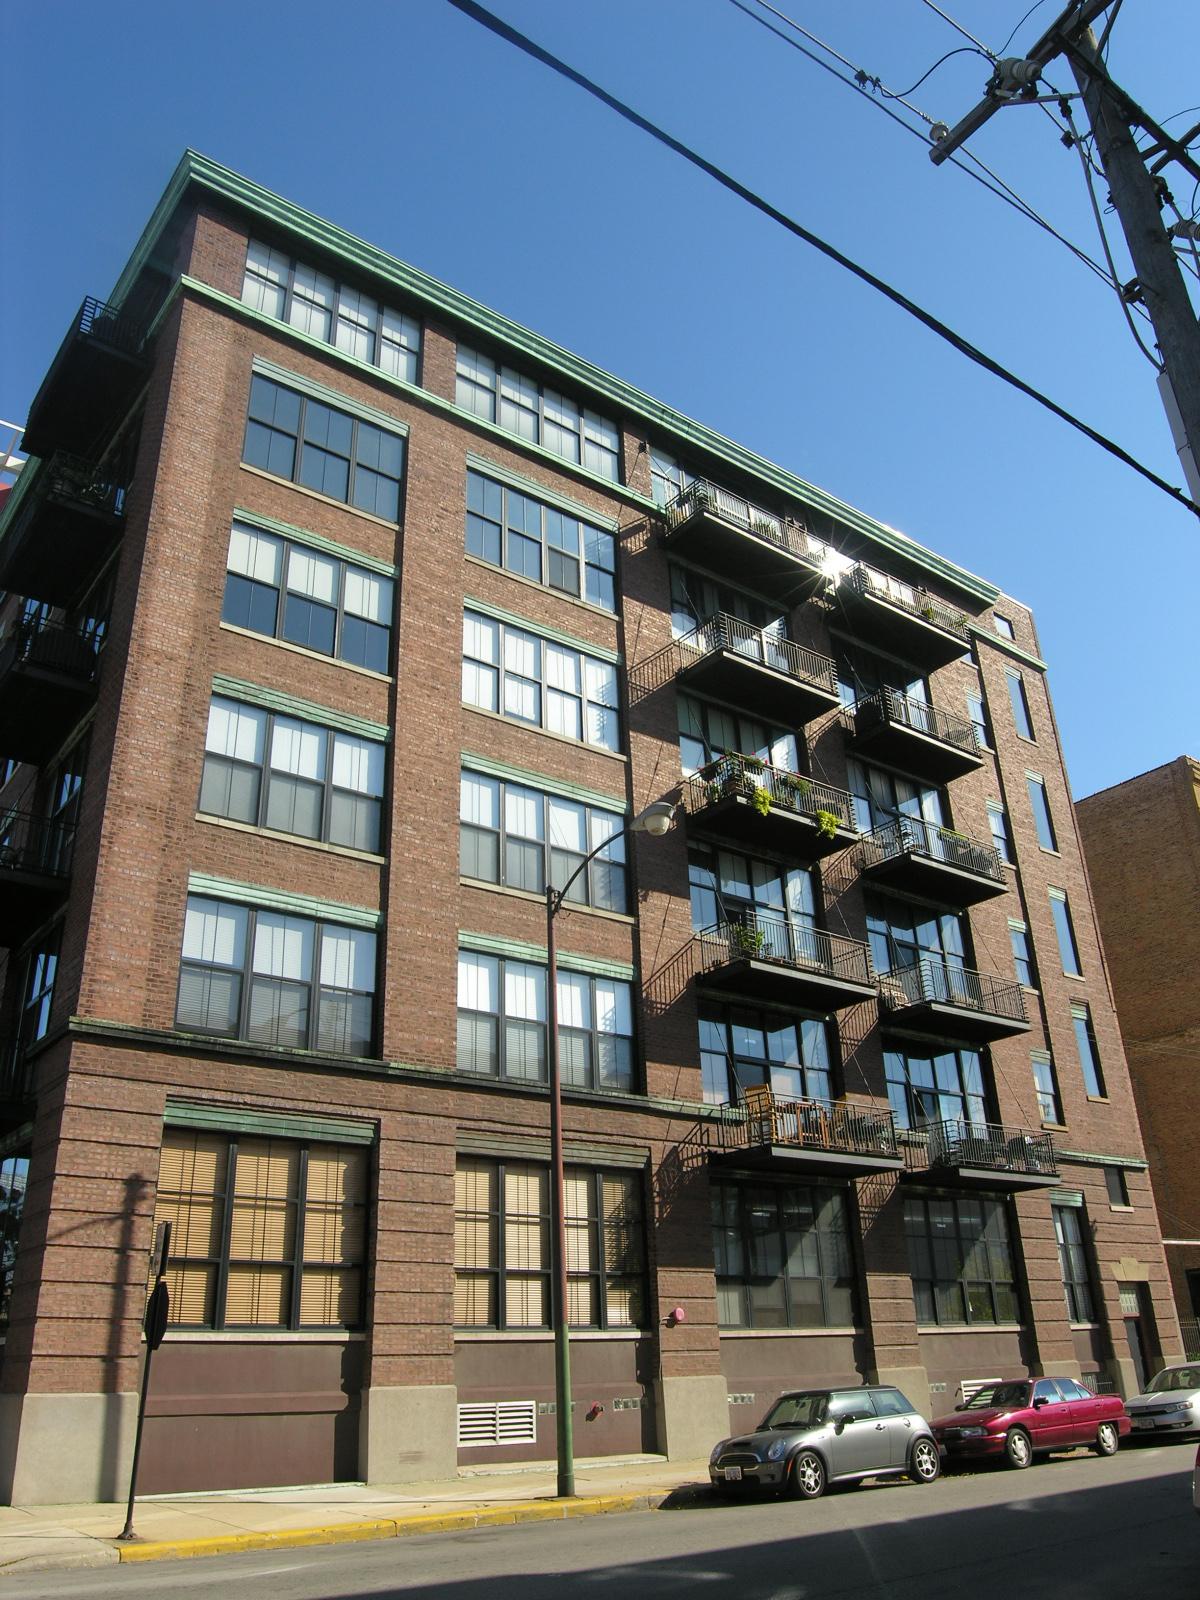 Washington Boulevard Lofts, 817 W Washington Blvd, Chicago